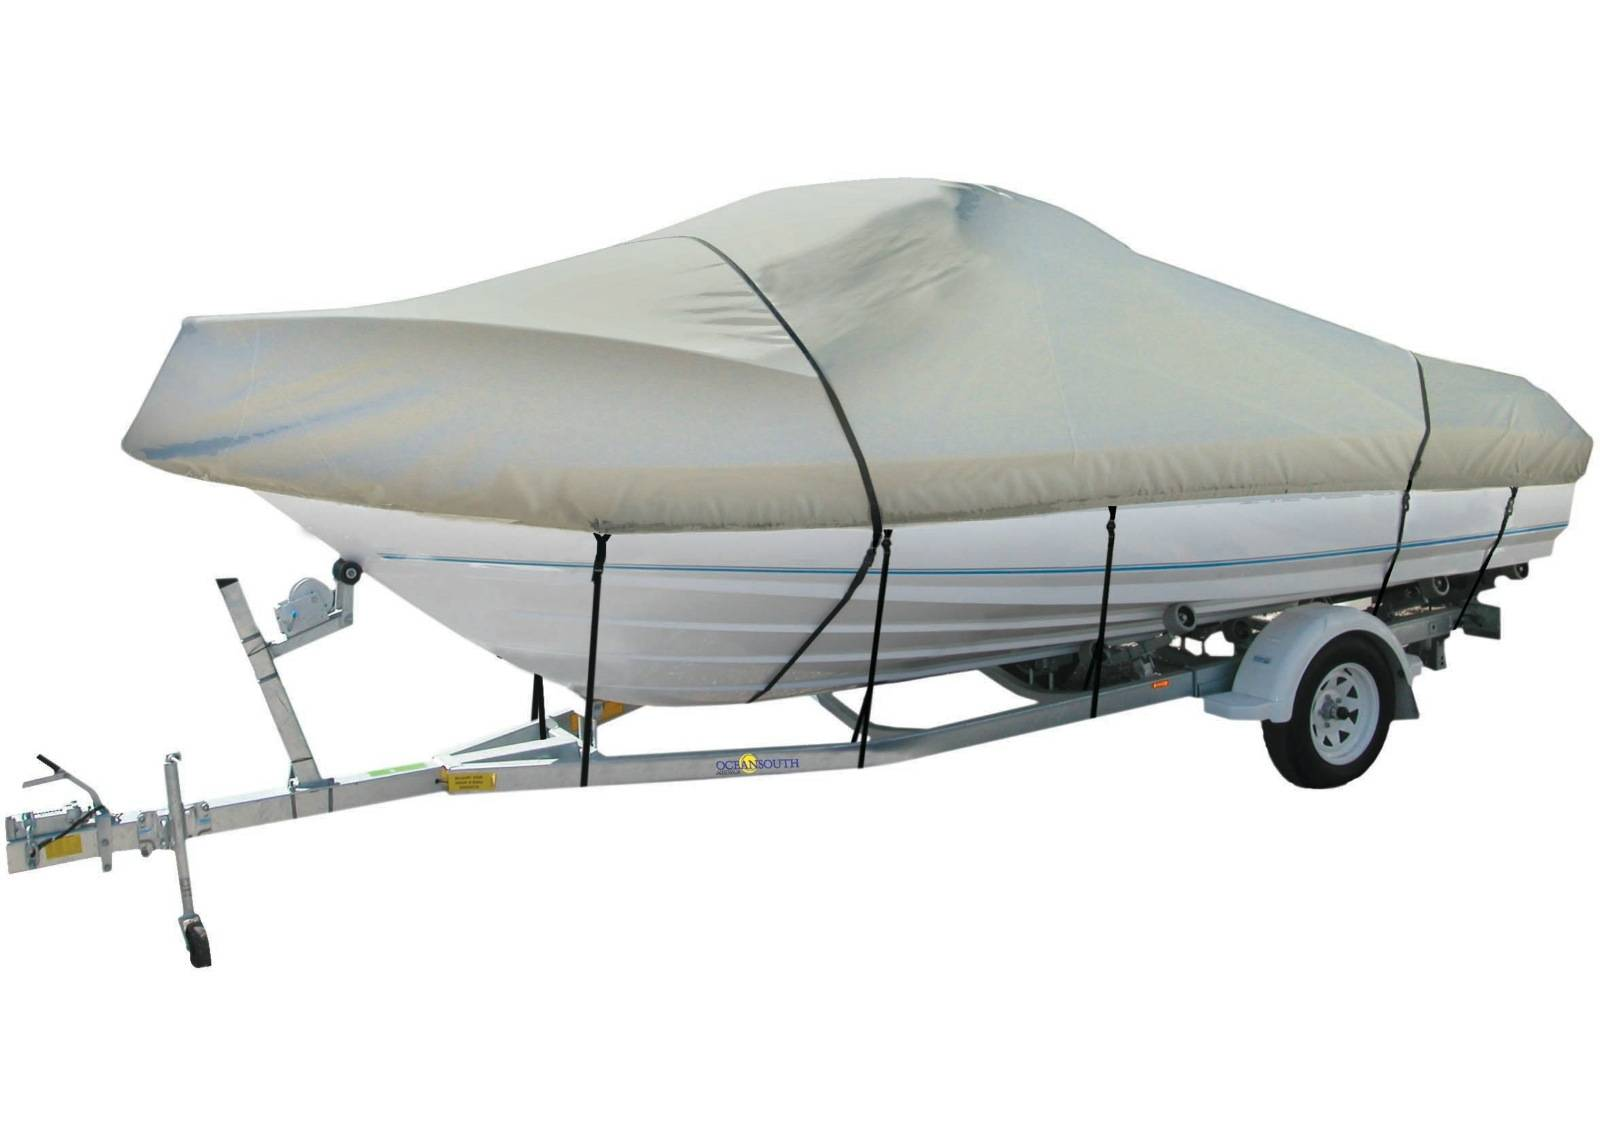 OceanSouth Venepeite Cabin Cruiser tyyppisille veneille 4.7-5.0 m